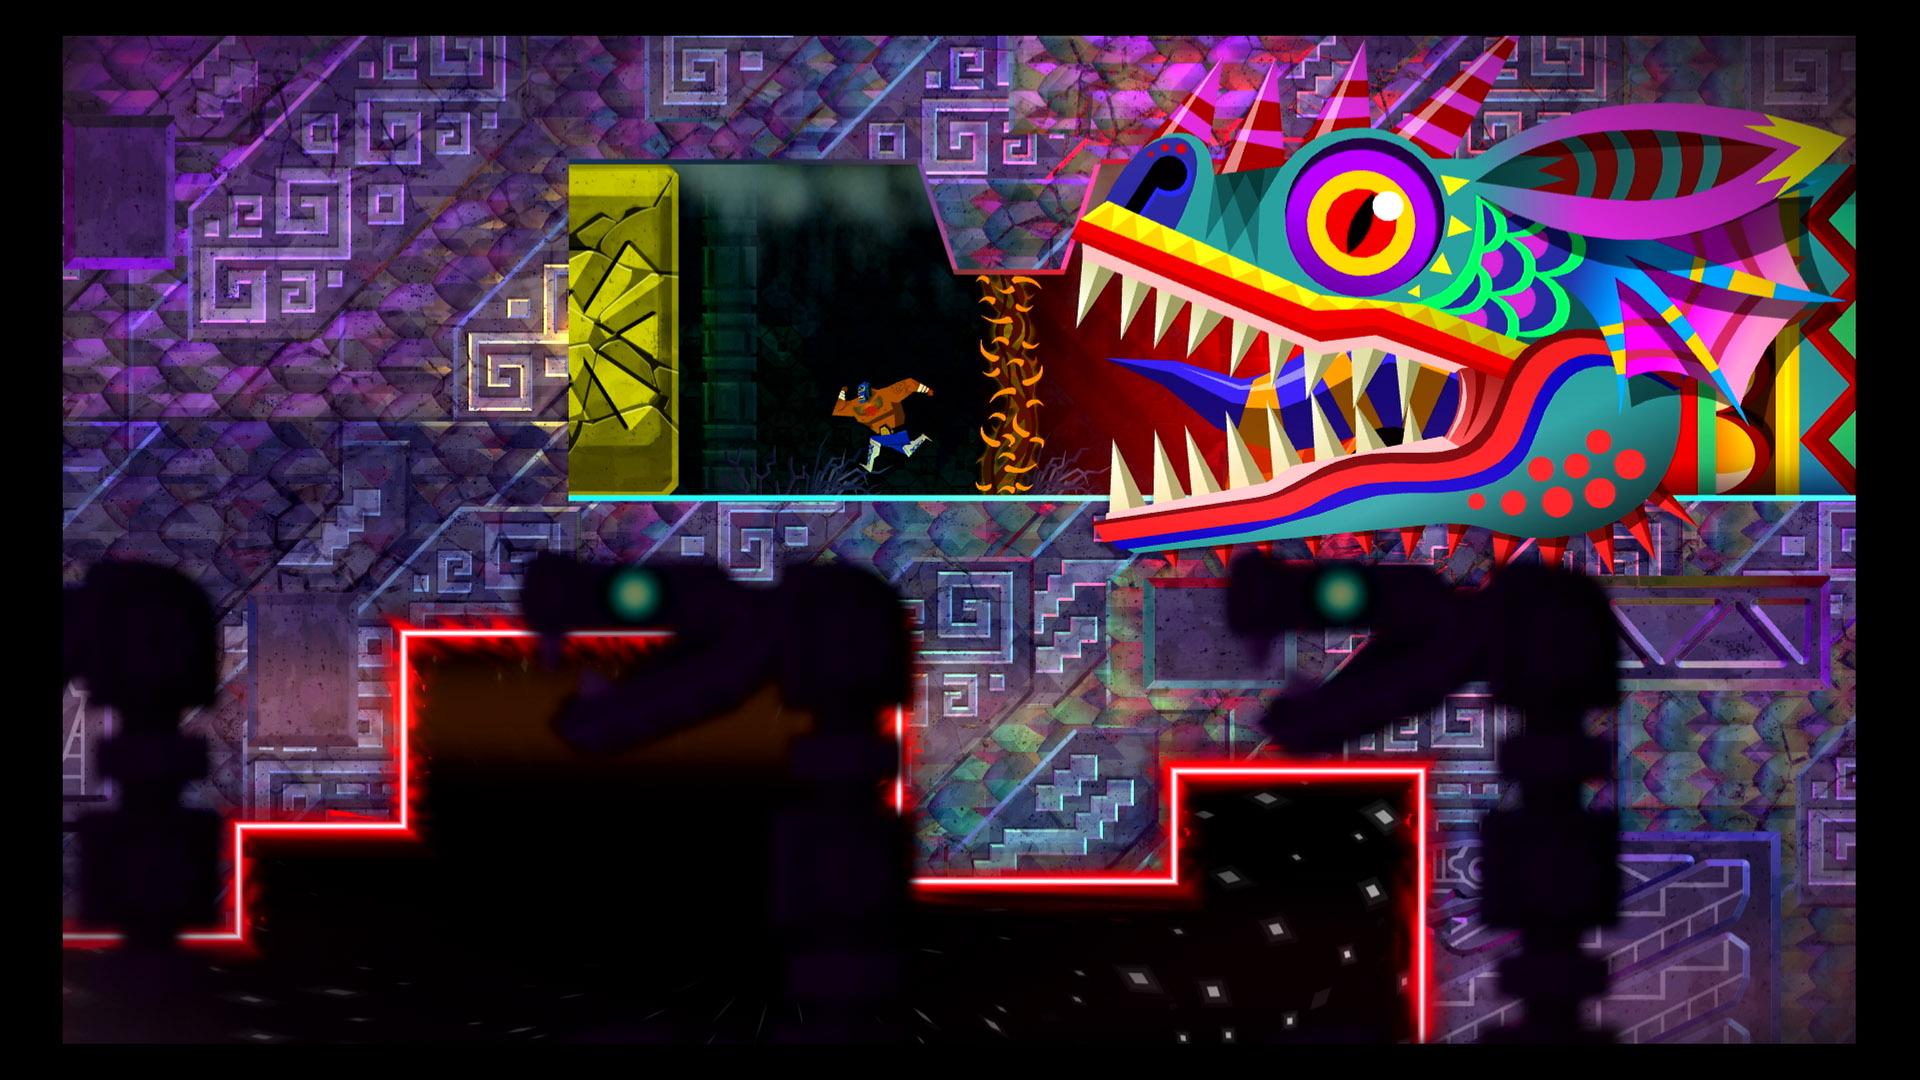 guacamelee2_screenshot_7.jpg